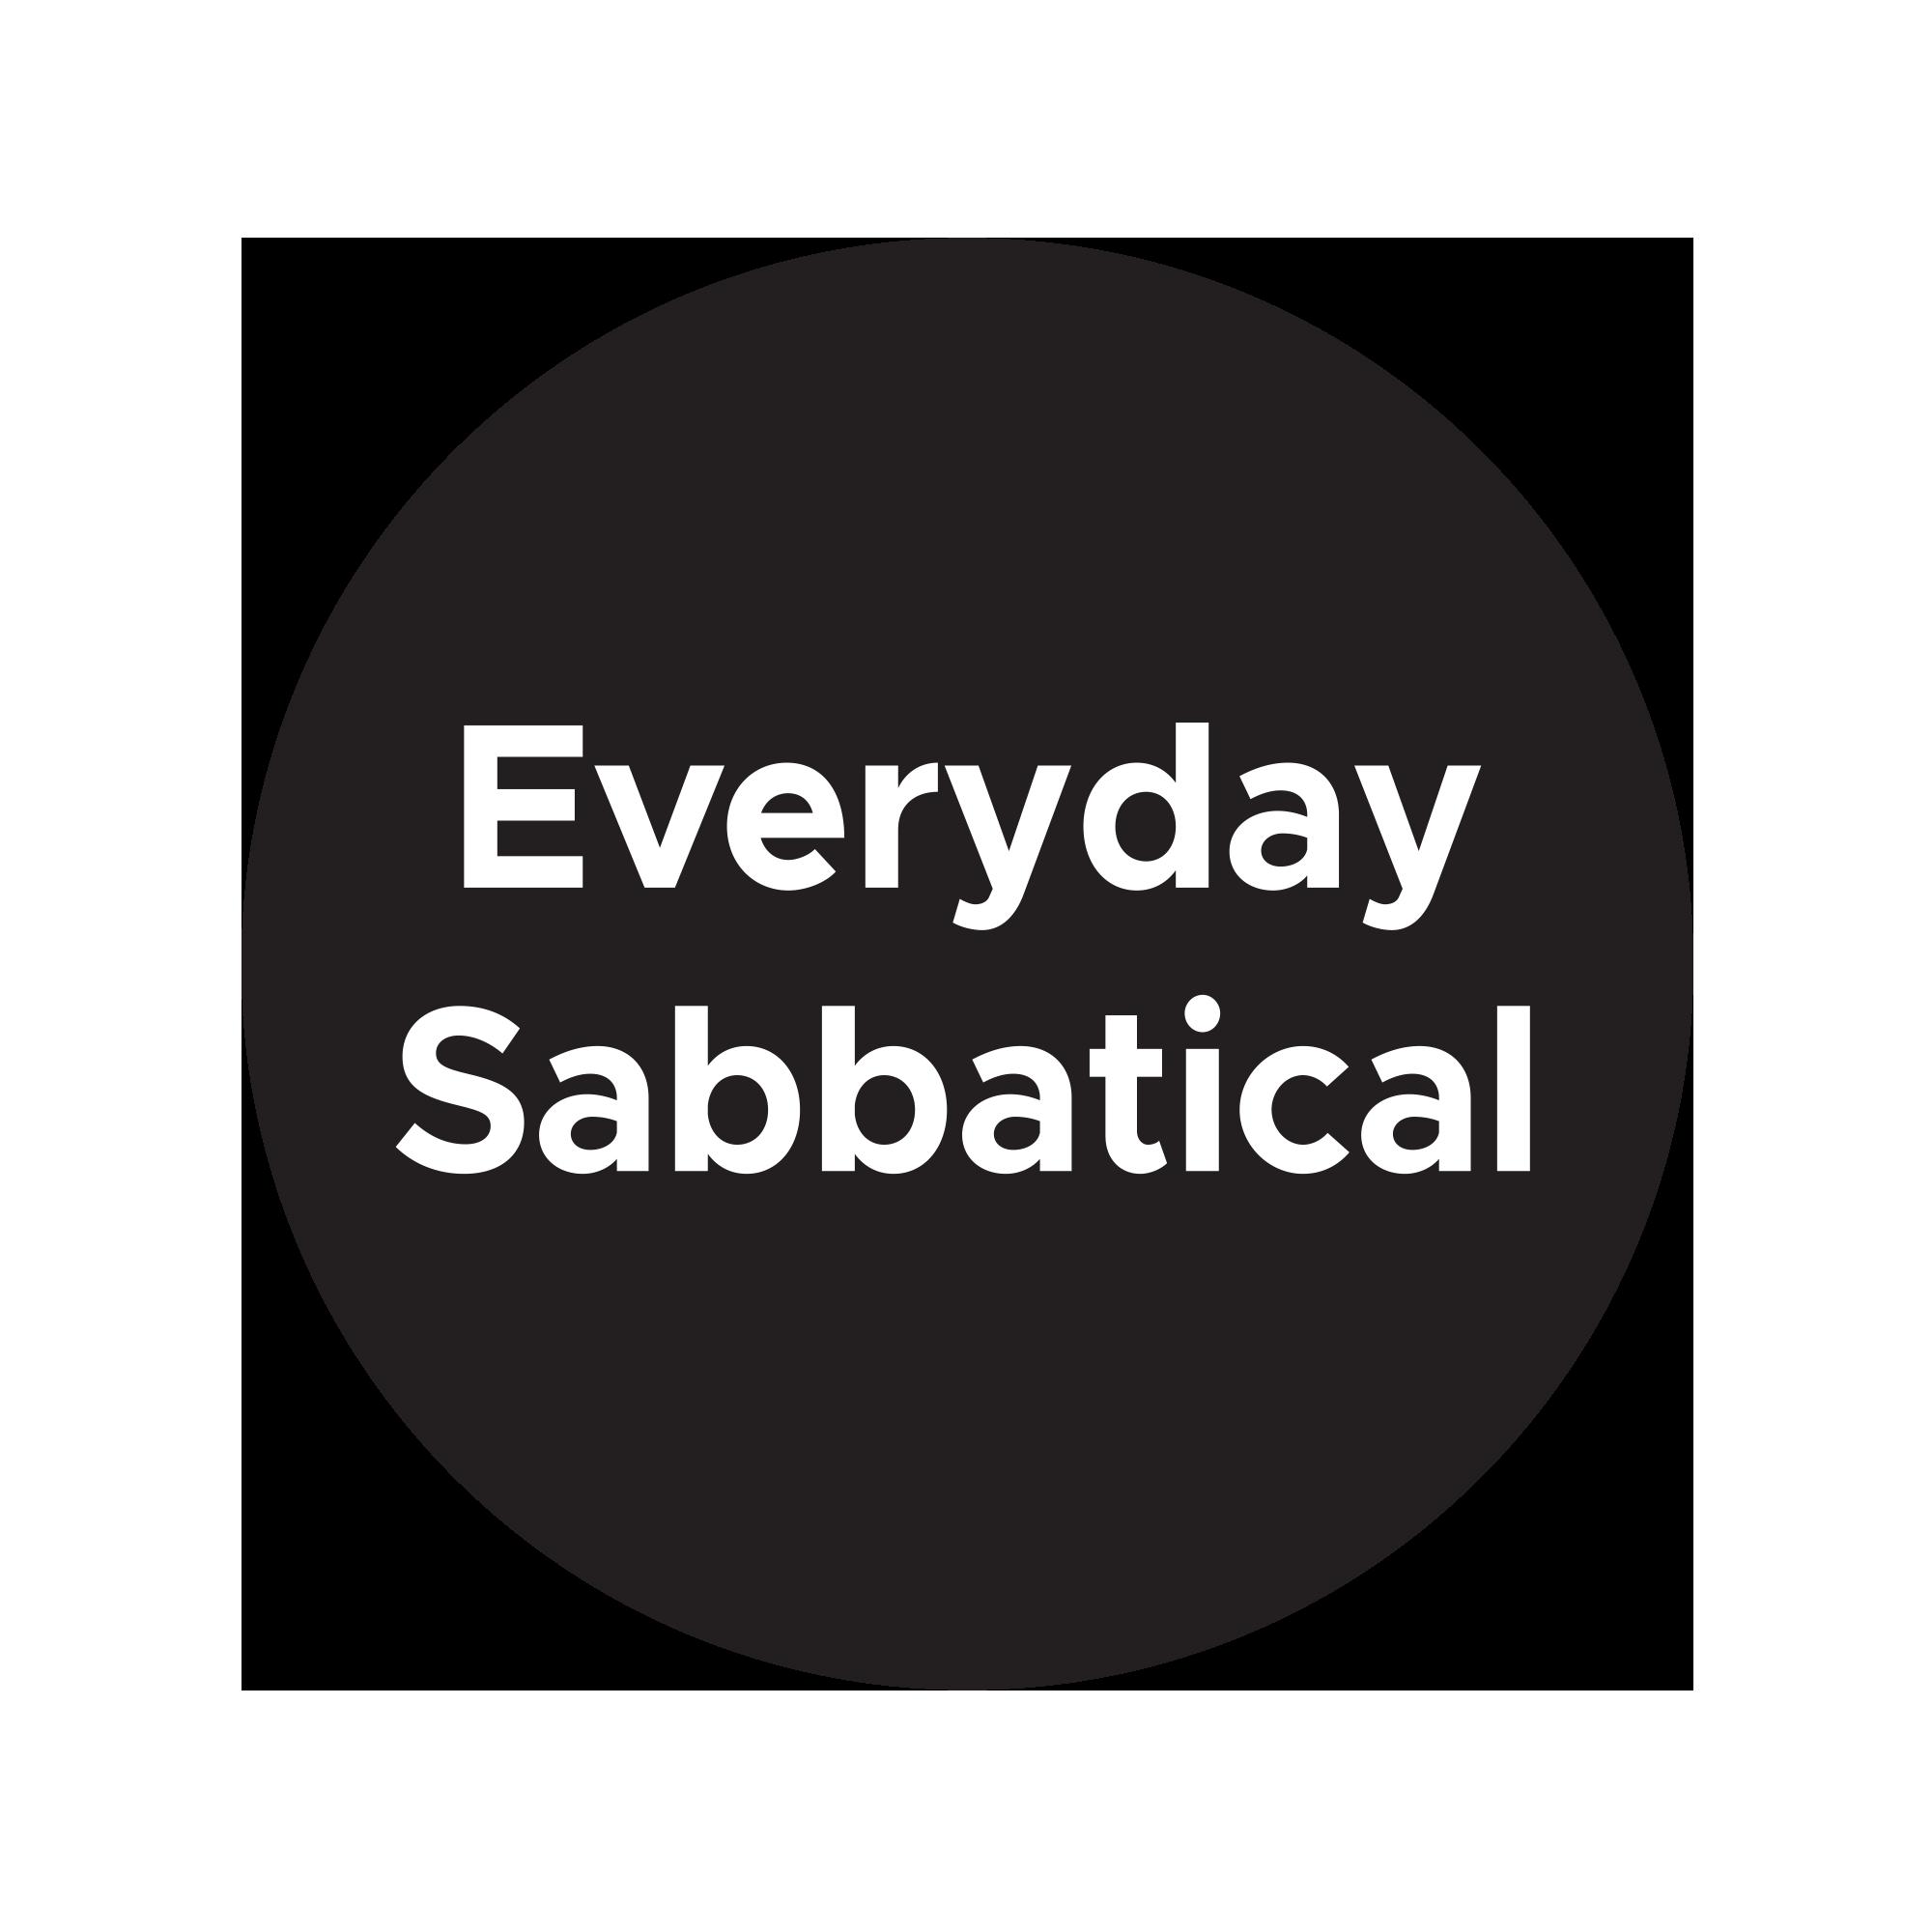 Everyday Sabbatical